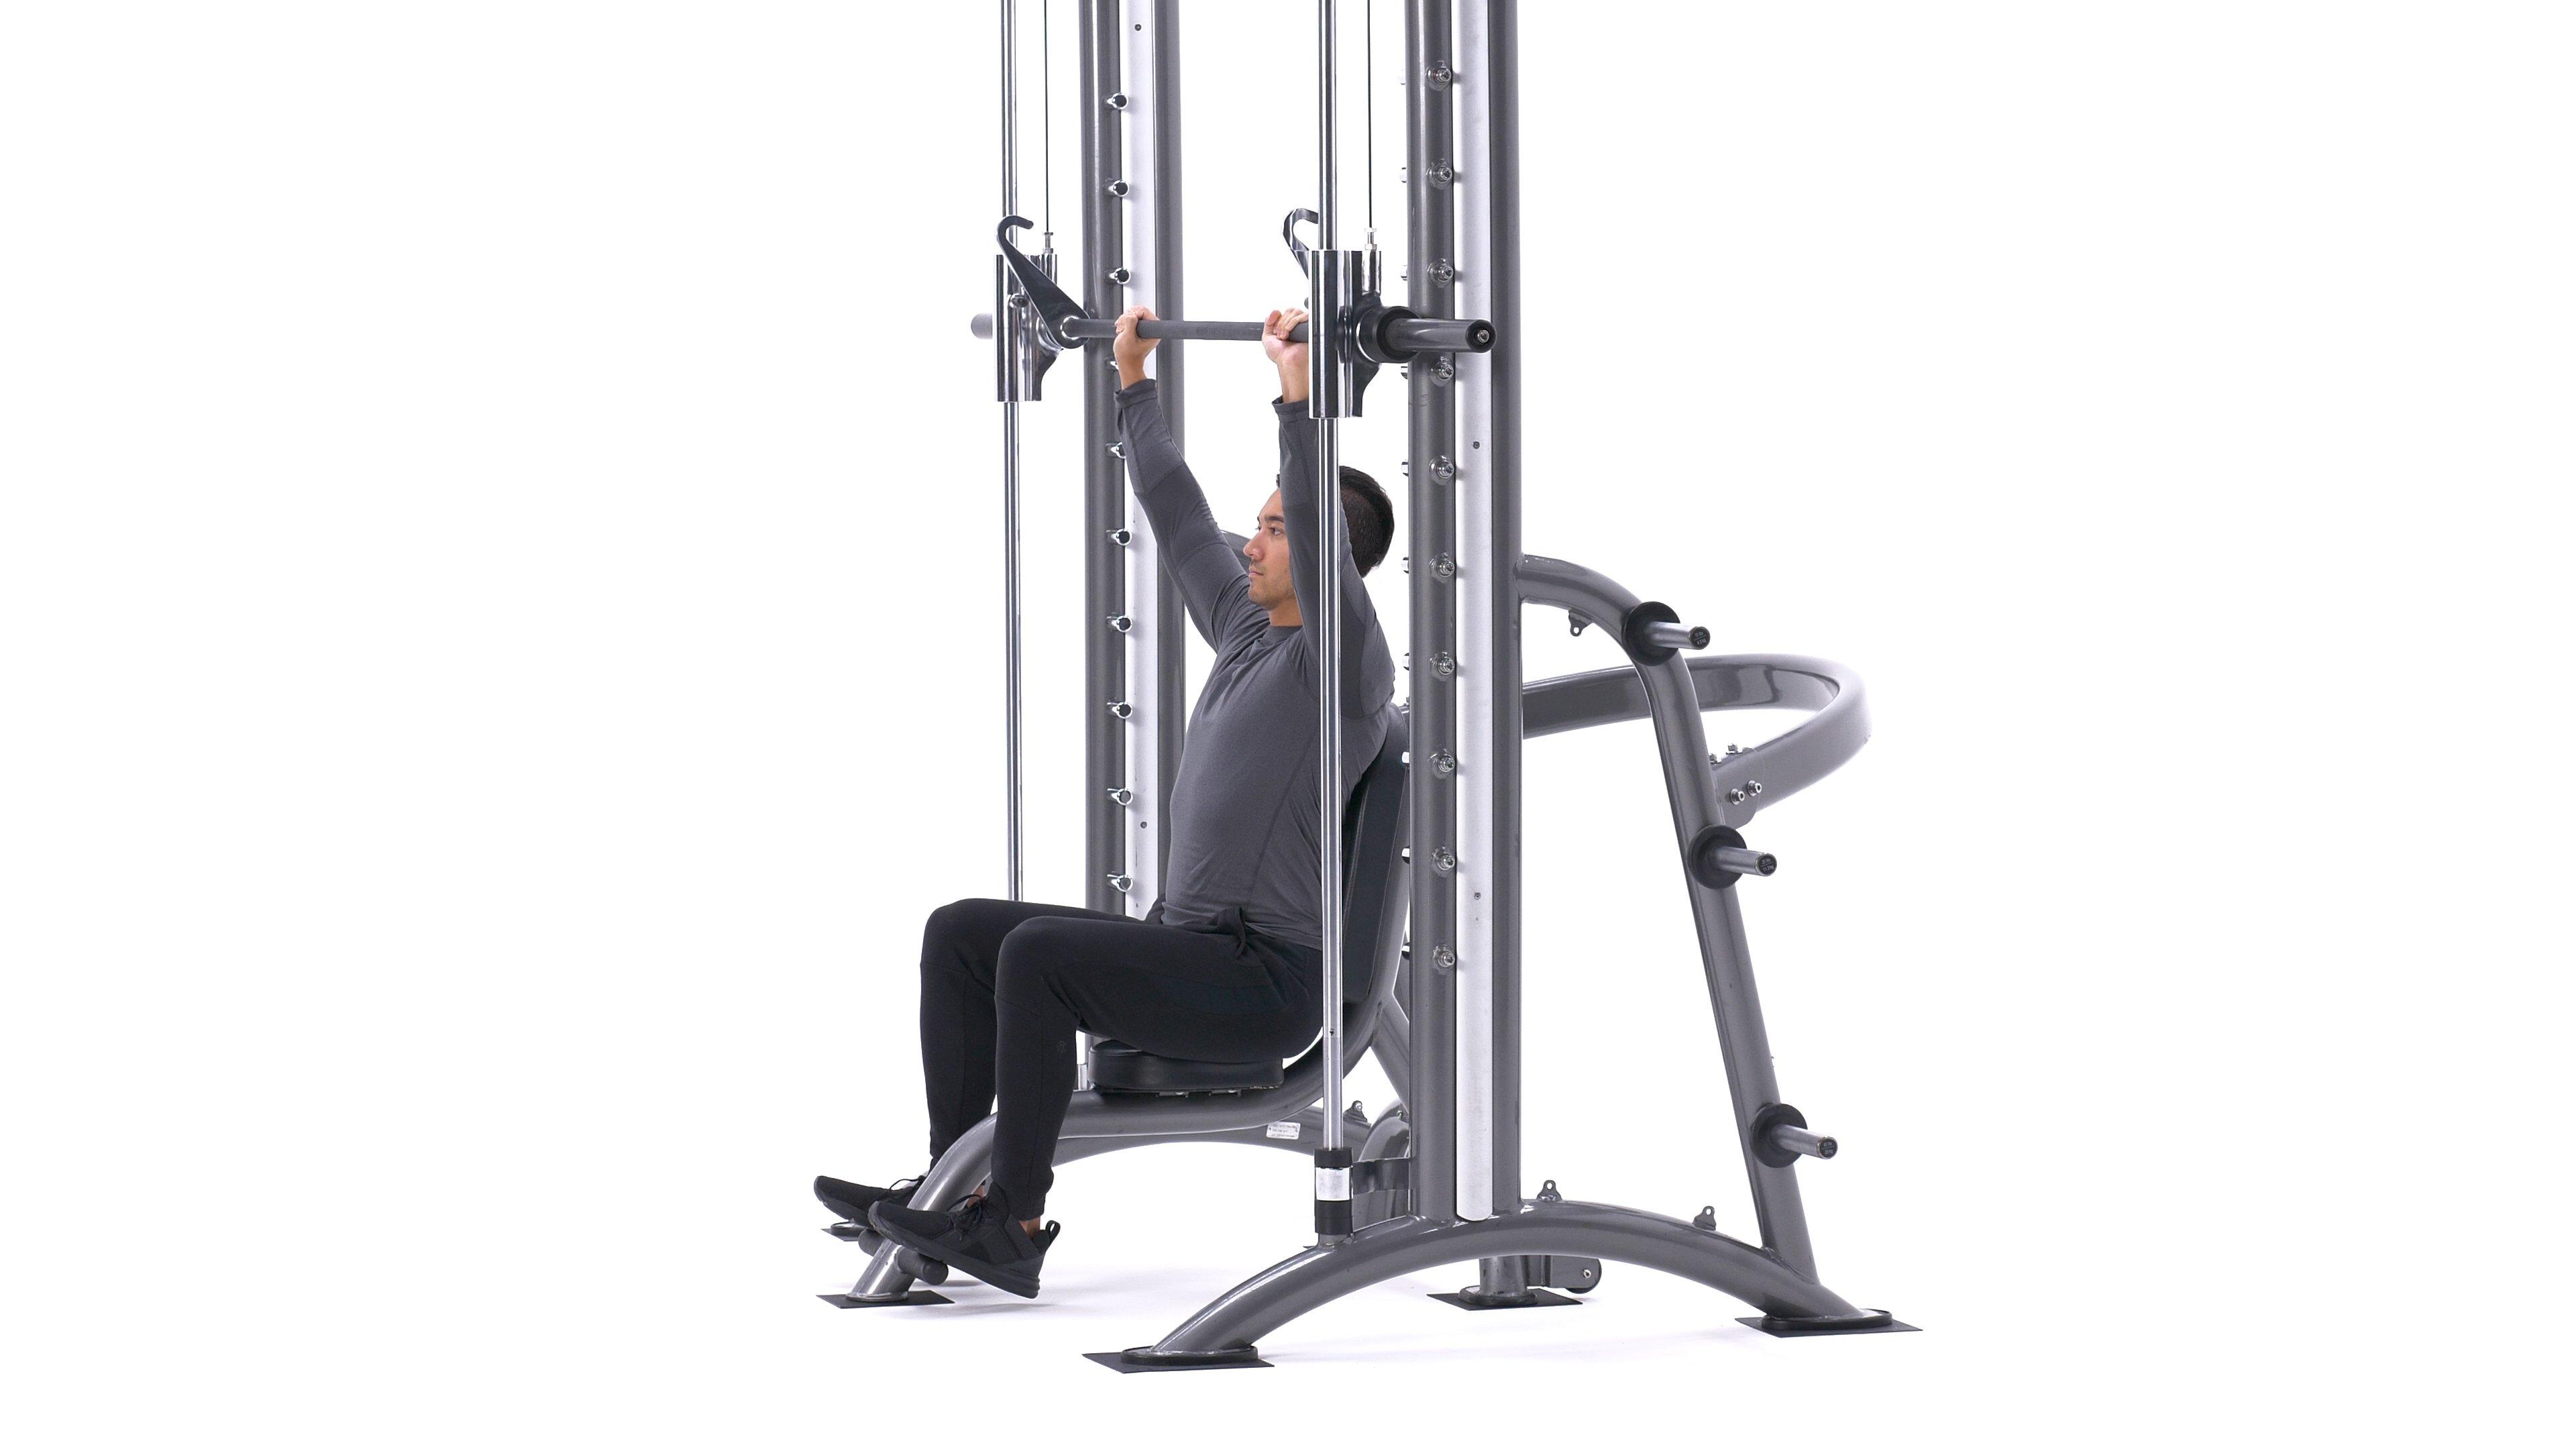 Smith machine shoulder press image